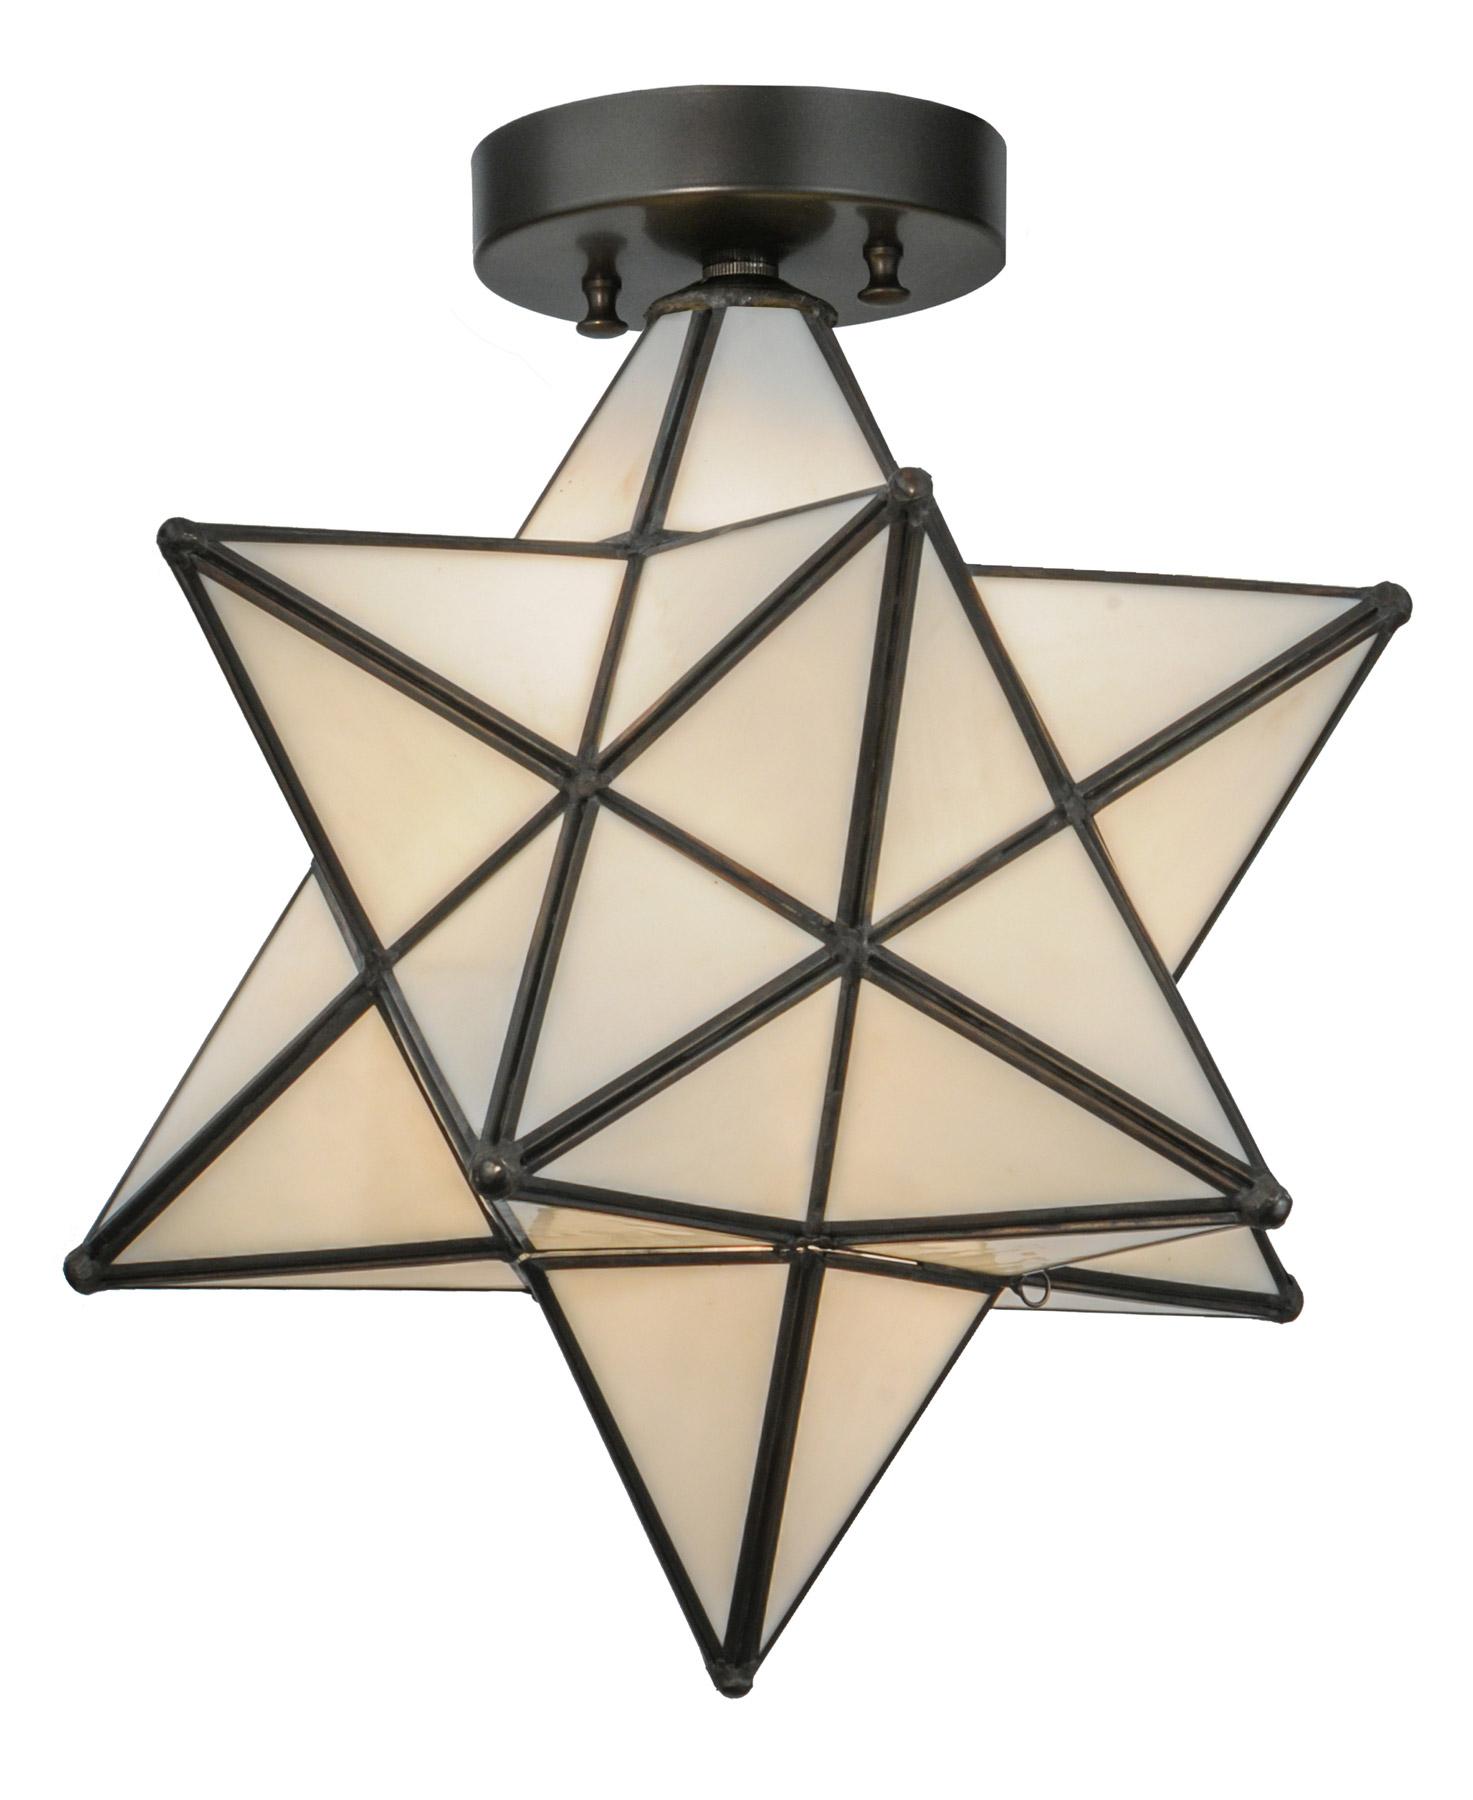 Meyda moravian star flush mount ceiling fixture